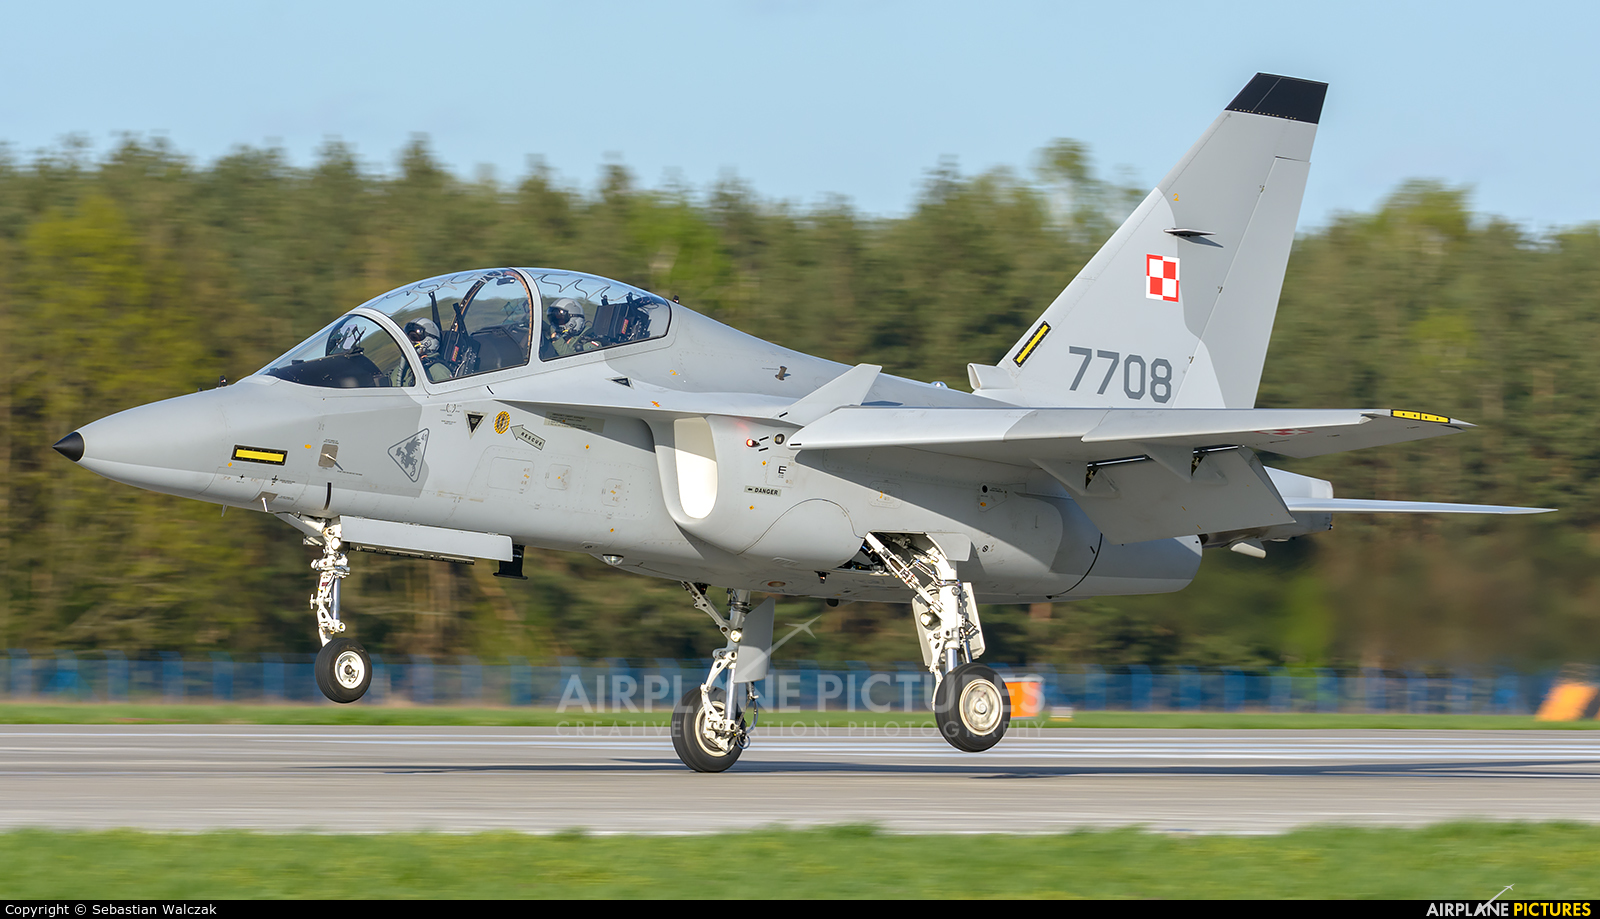 Poland - Air Force 7708 aircraft at Dęblin